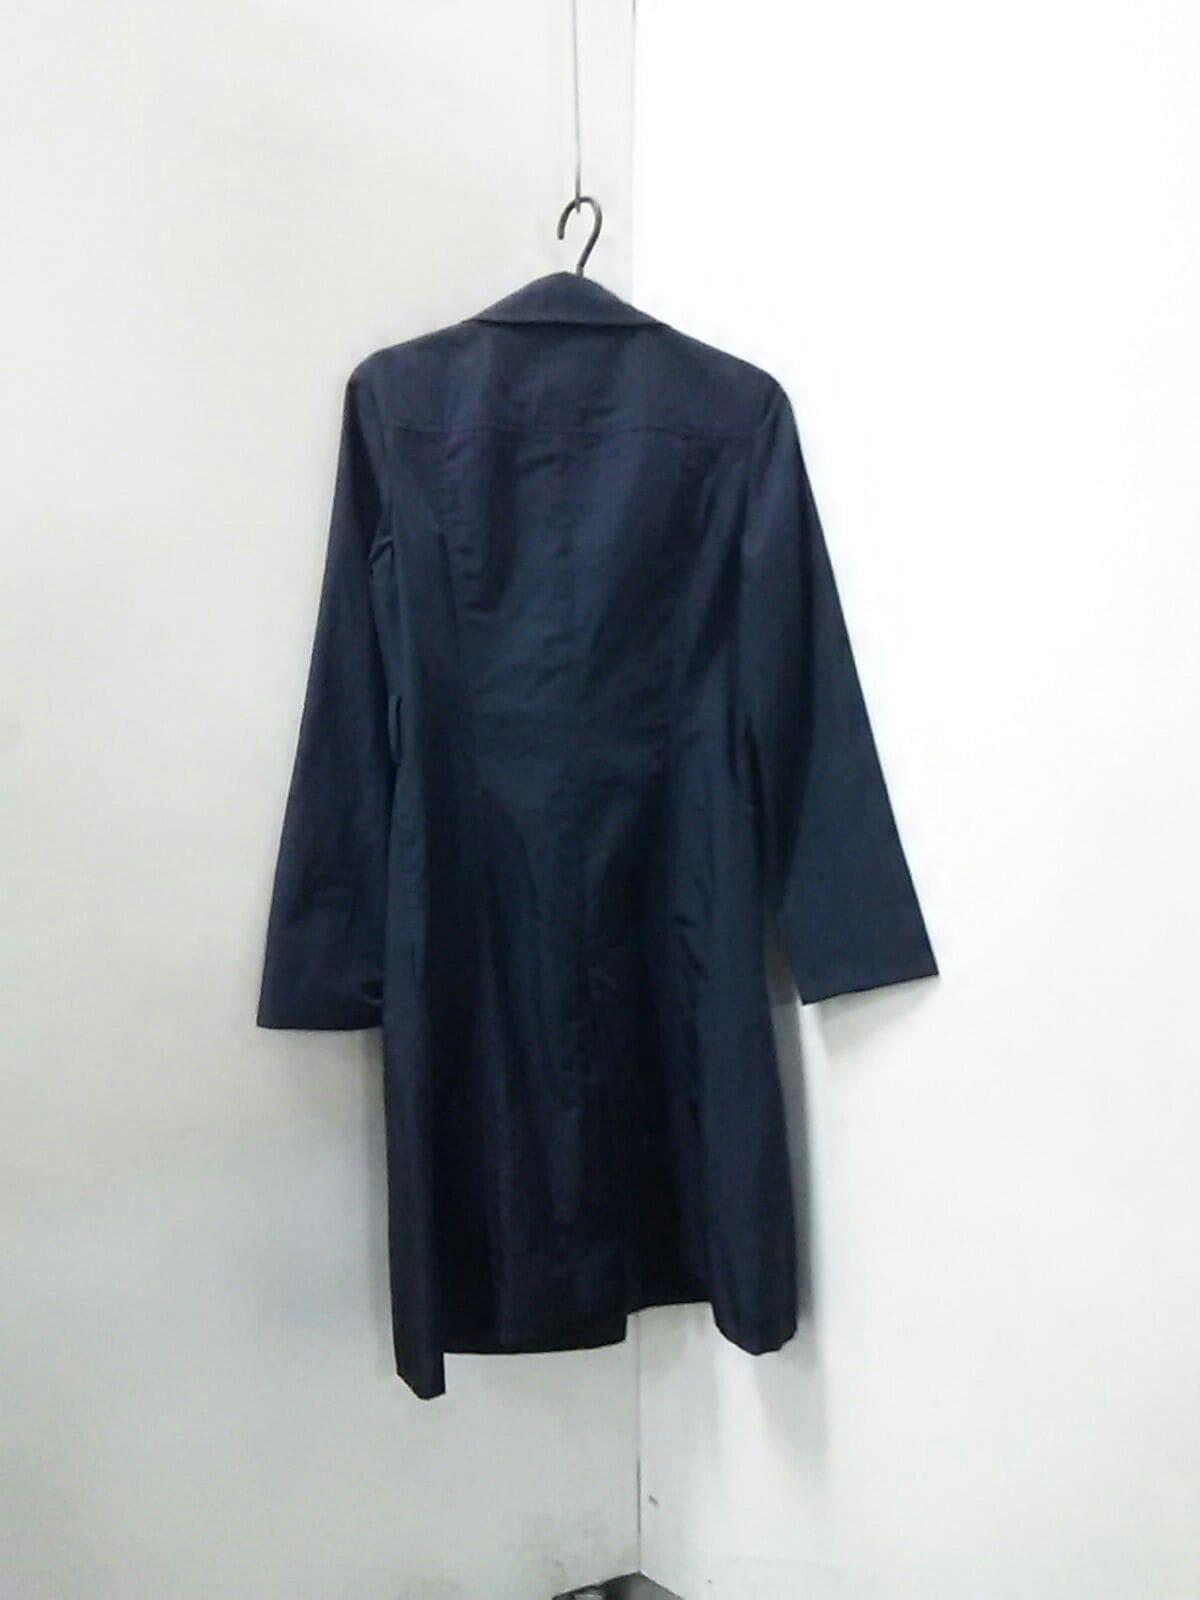 Brilliantstage(ブリリアントステージ)のコート